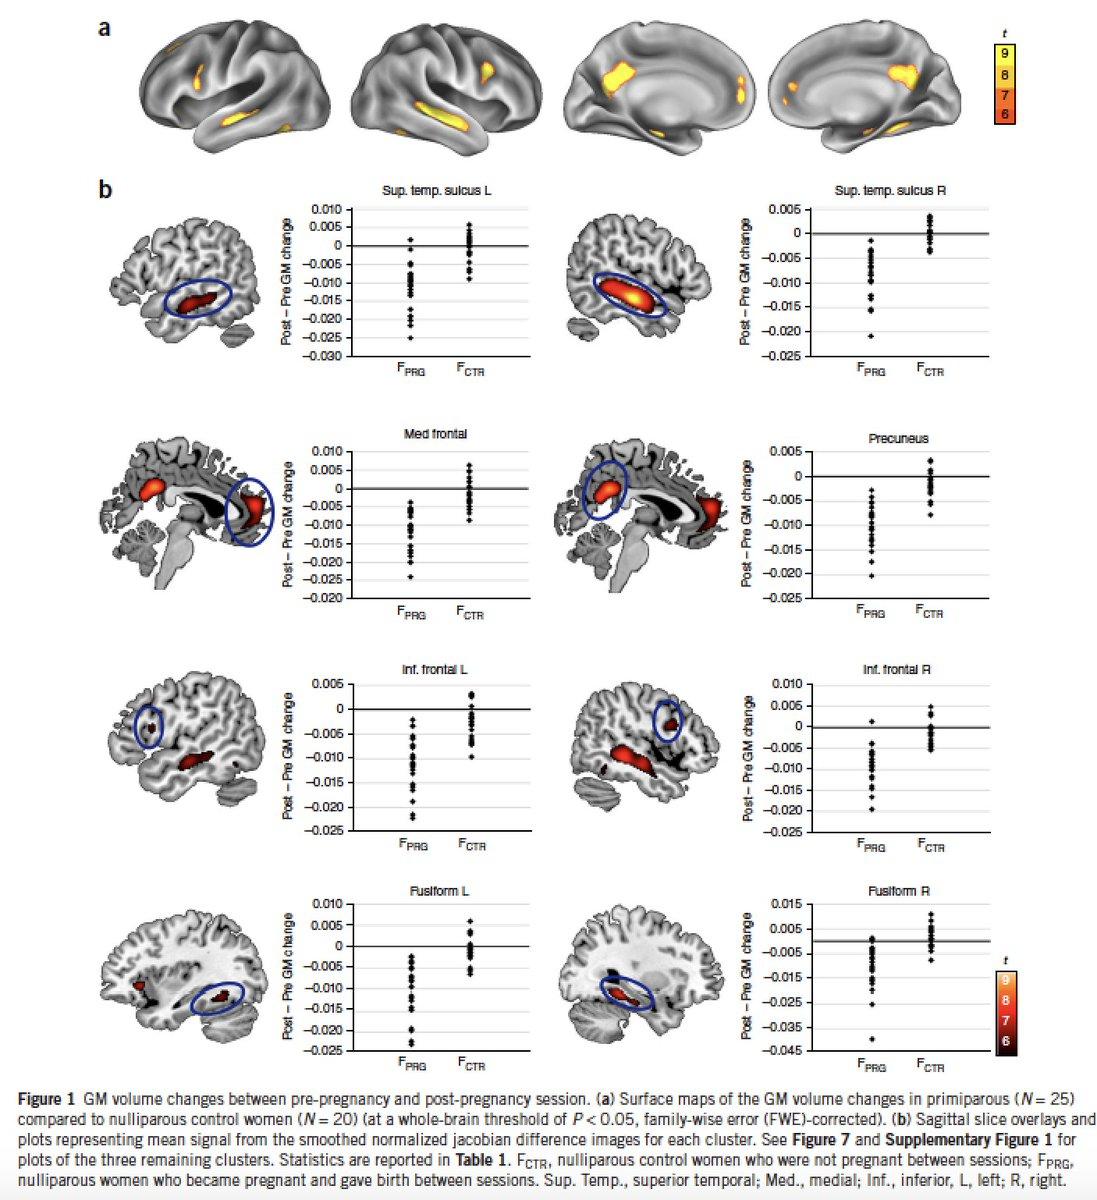 Http Www Nature Com Neuro Journal Vaop Ncurrent Full Nn  Html